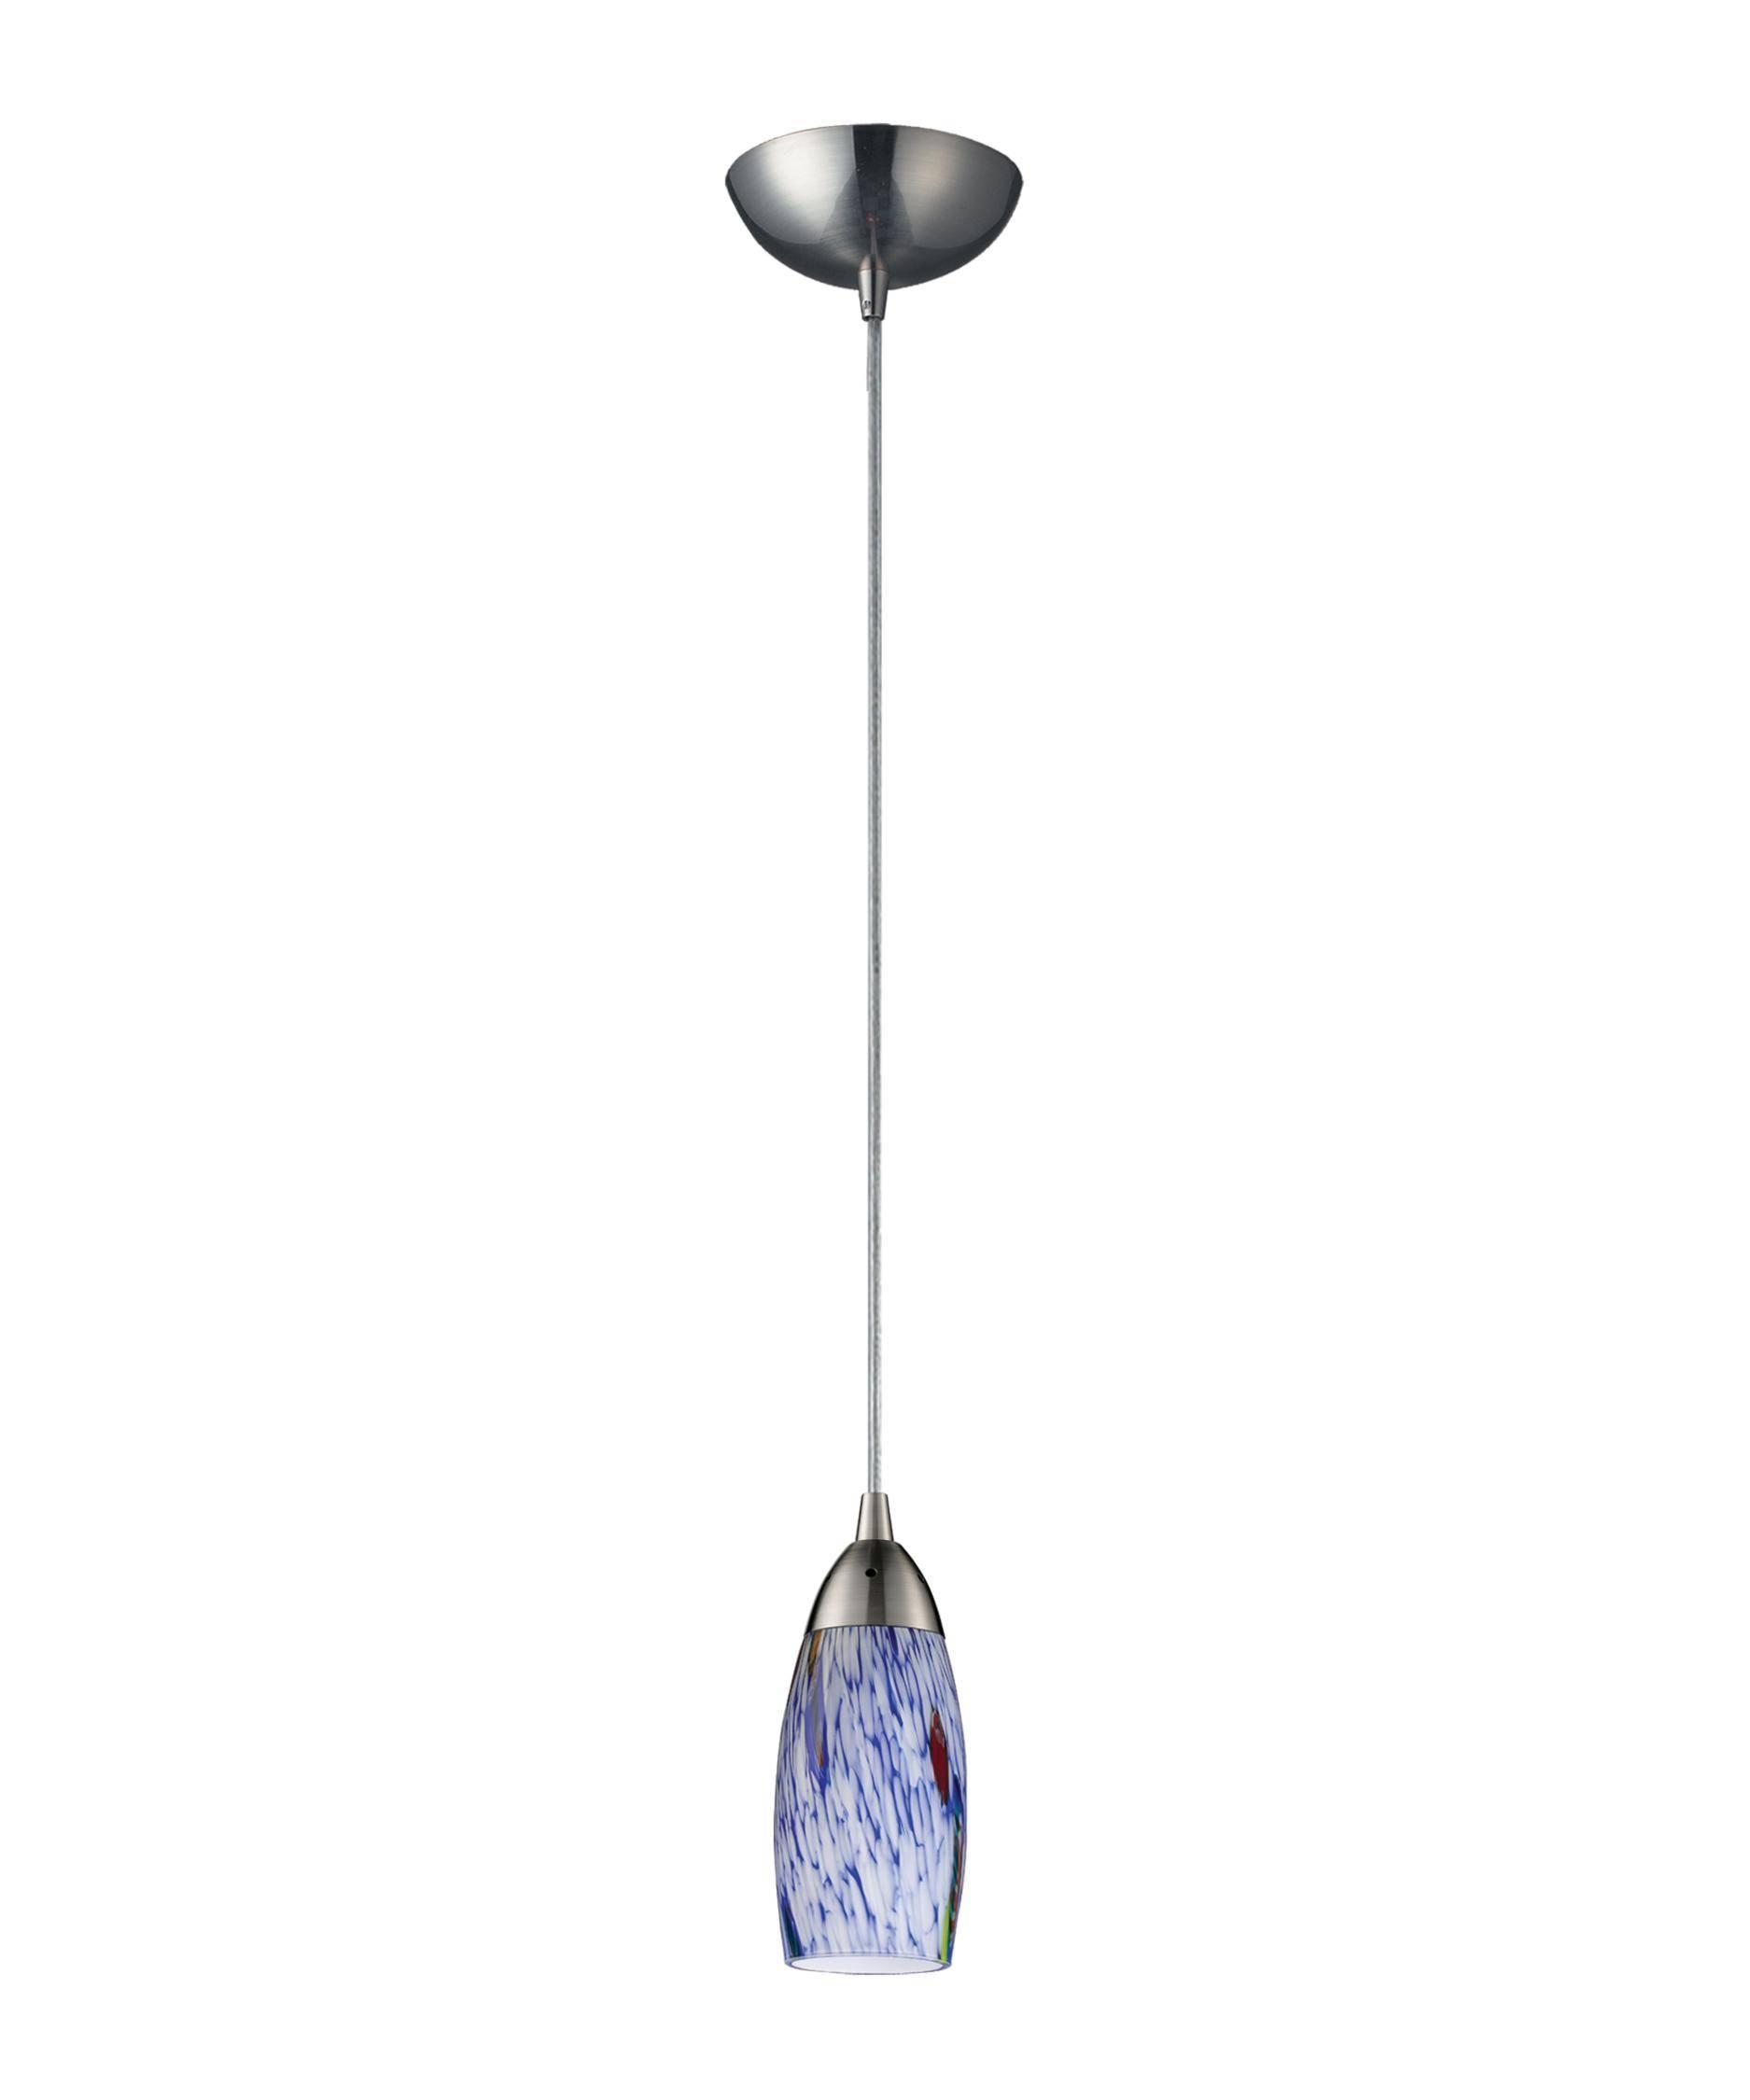 Elk Lighting 110-1 Milan 3 Inch Wide 1 Light Mini Pendant pertaining to Mini Pendant Lights (Image 4 of 15)